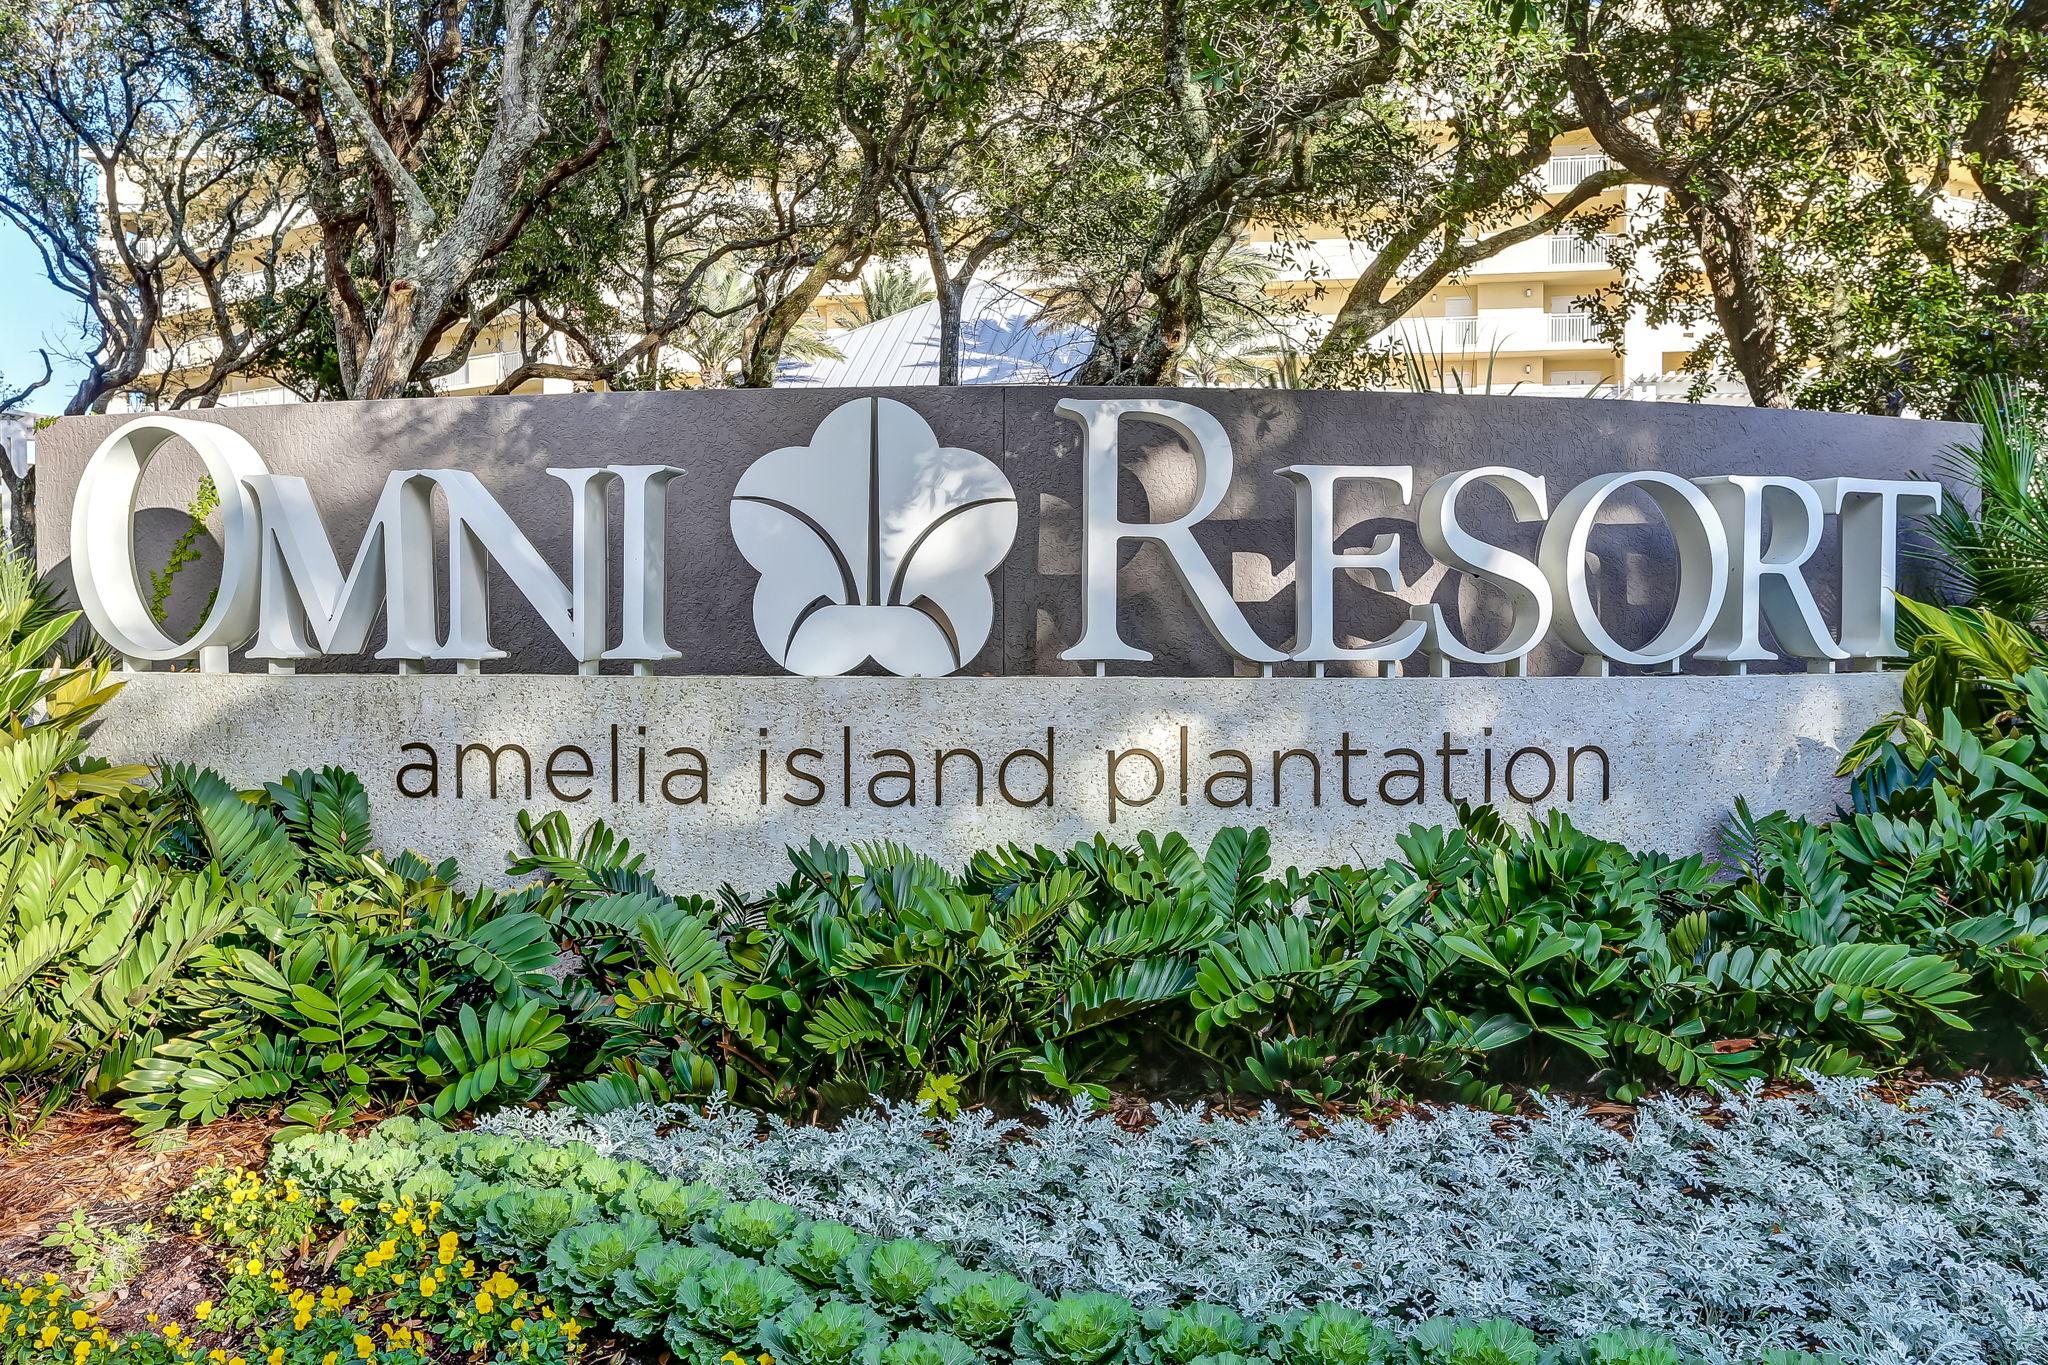 Amelia Island Plantation